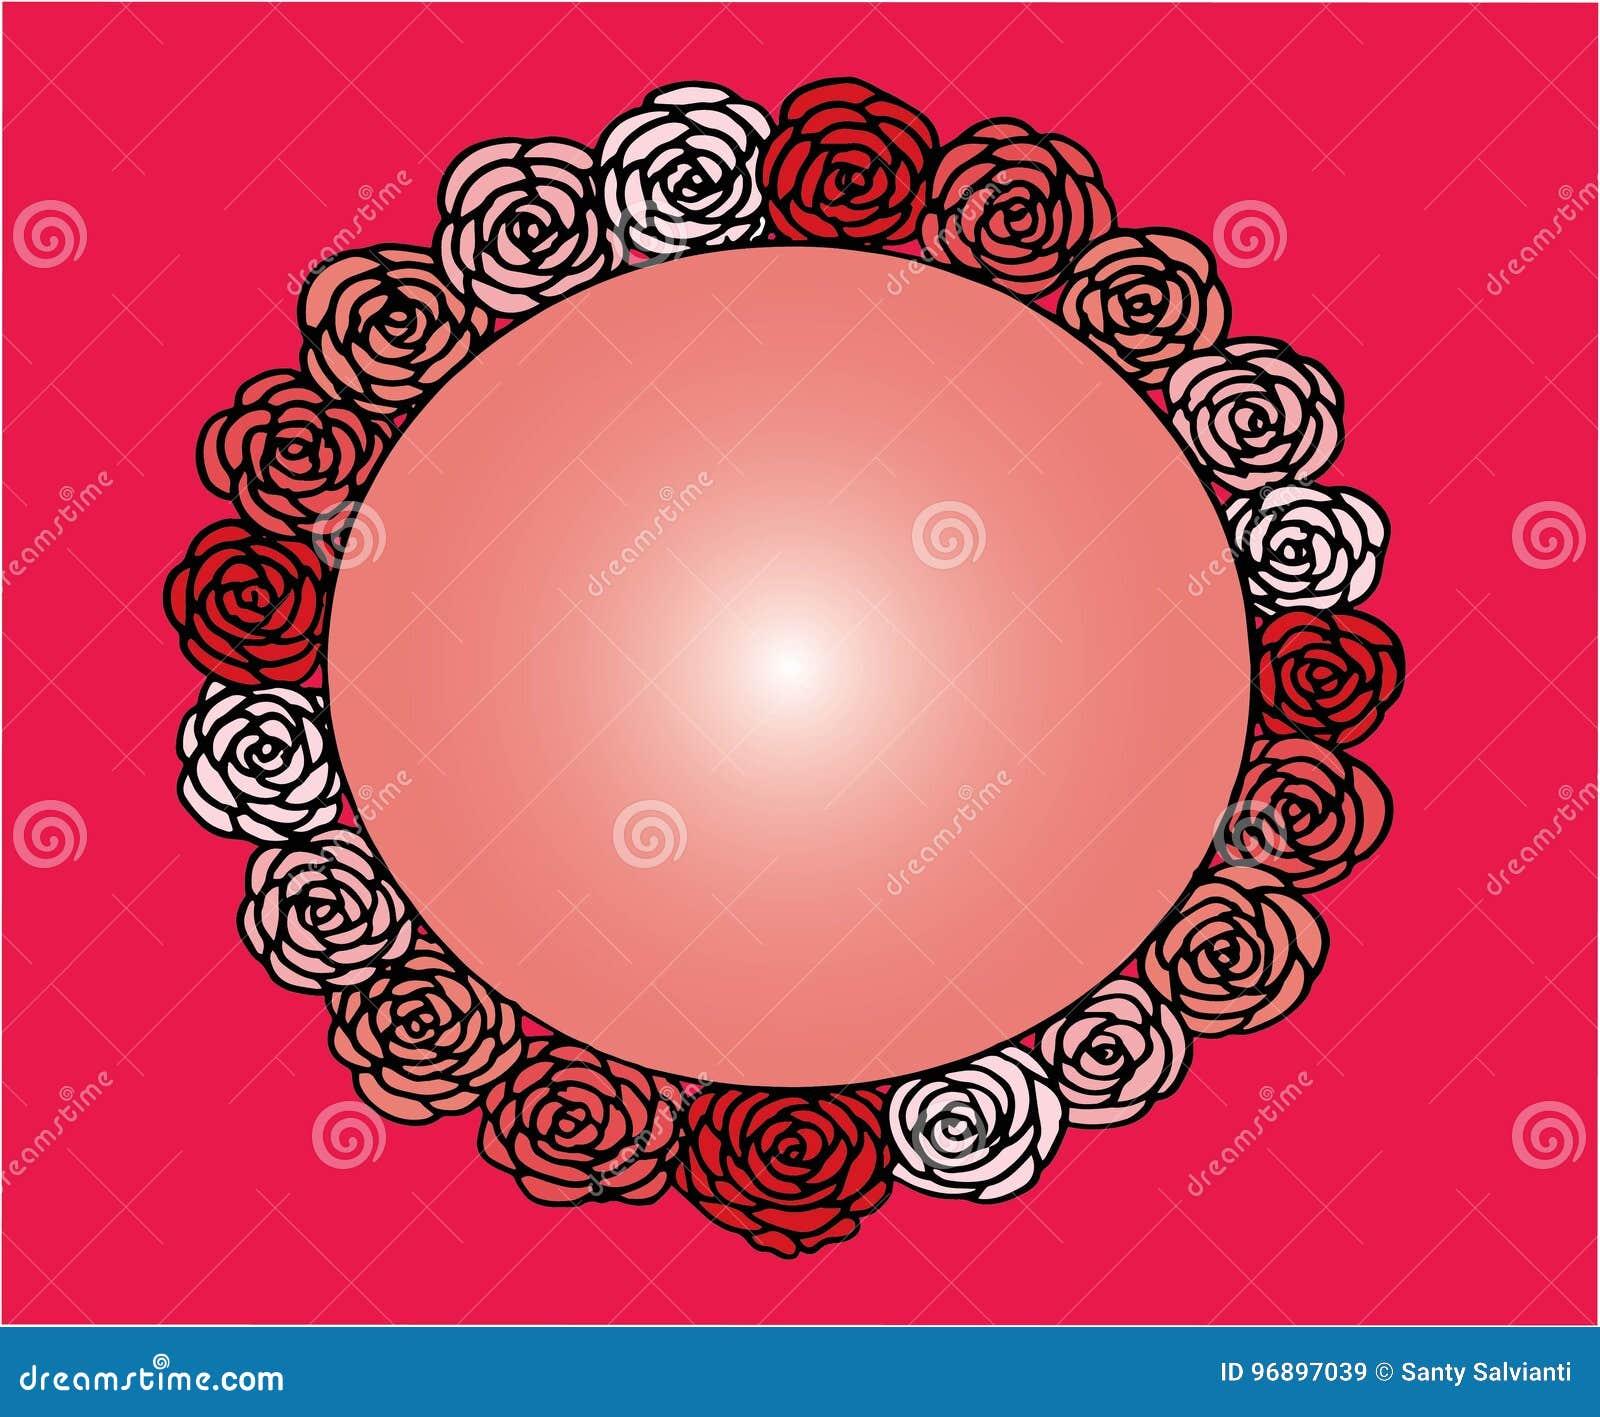 Rose Flower Cute Frame. Beautiful Wedding Invitation. Simple Doodle ...